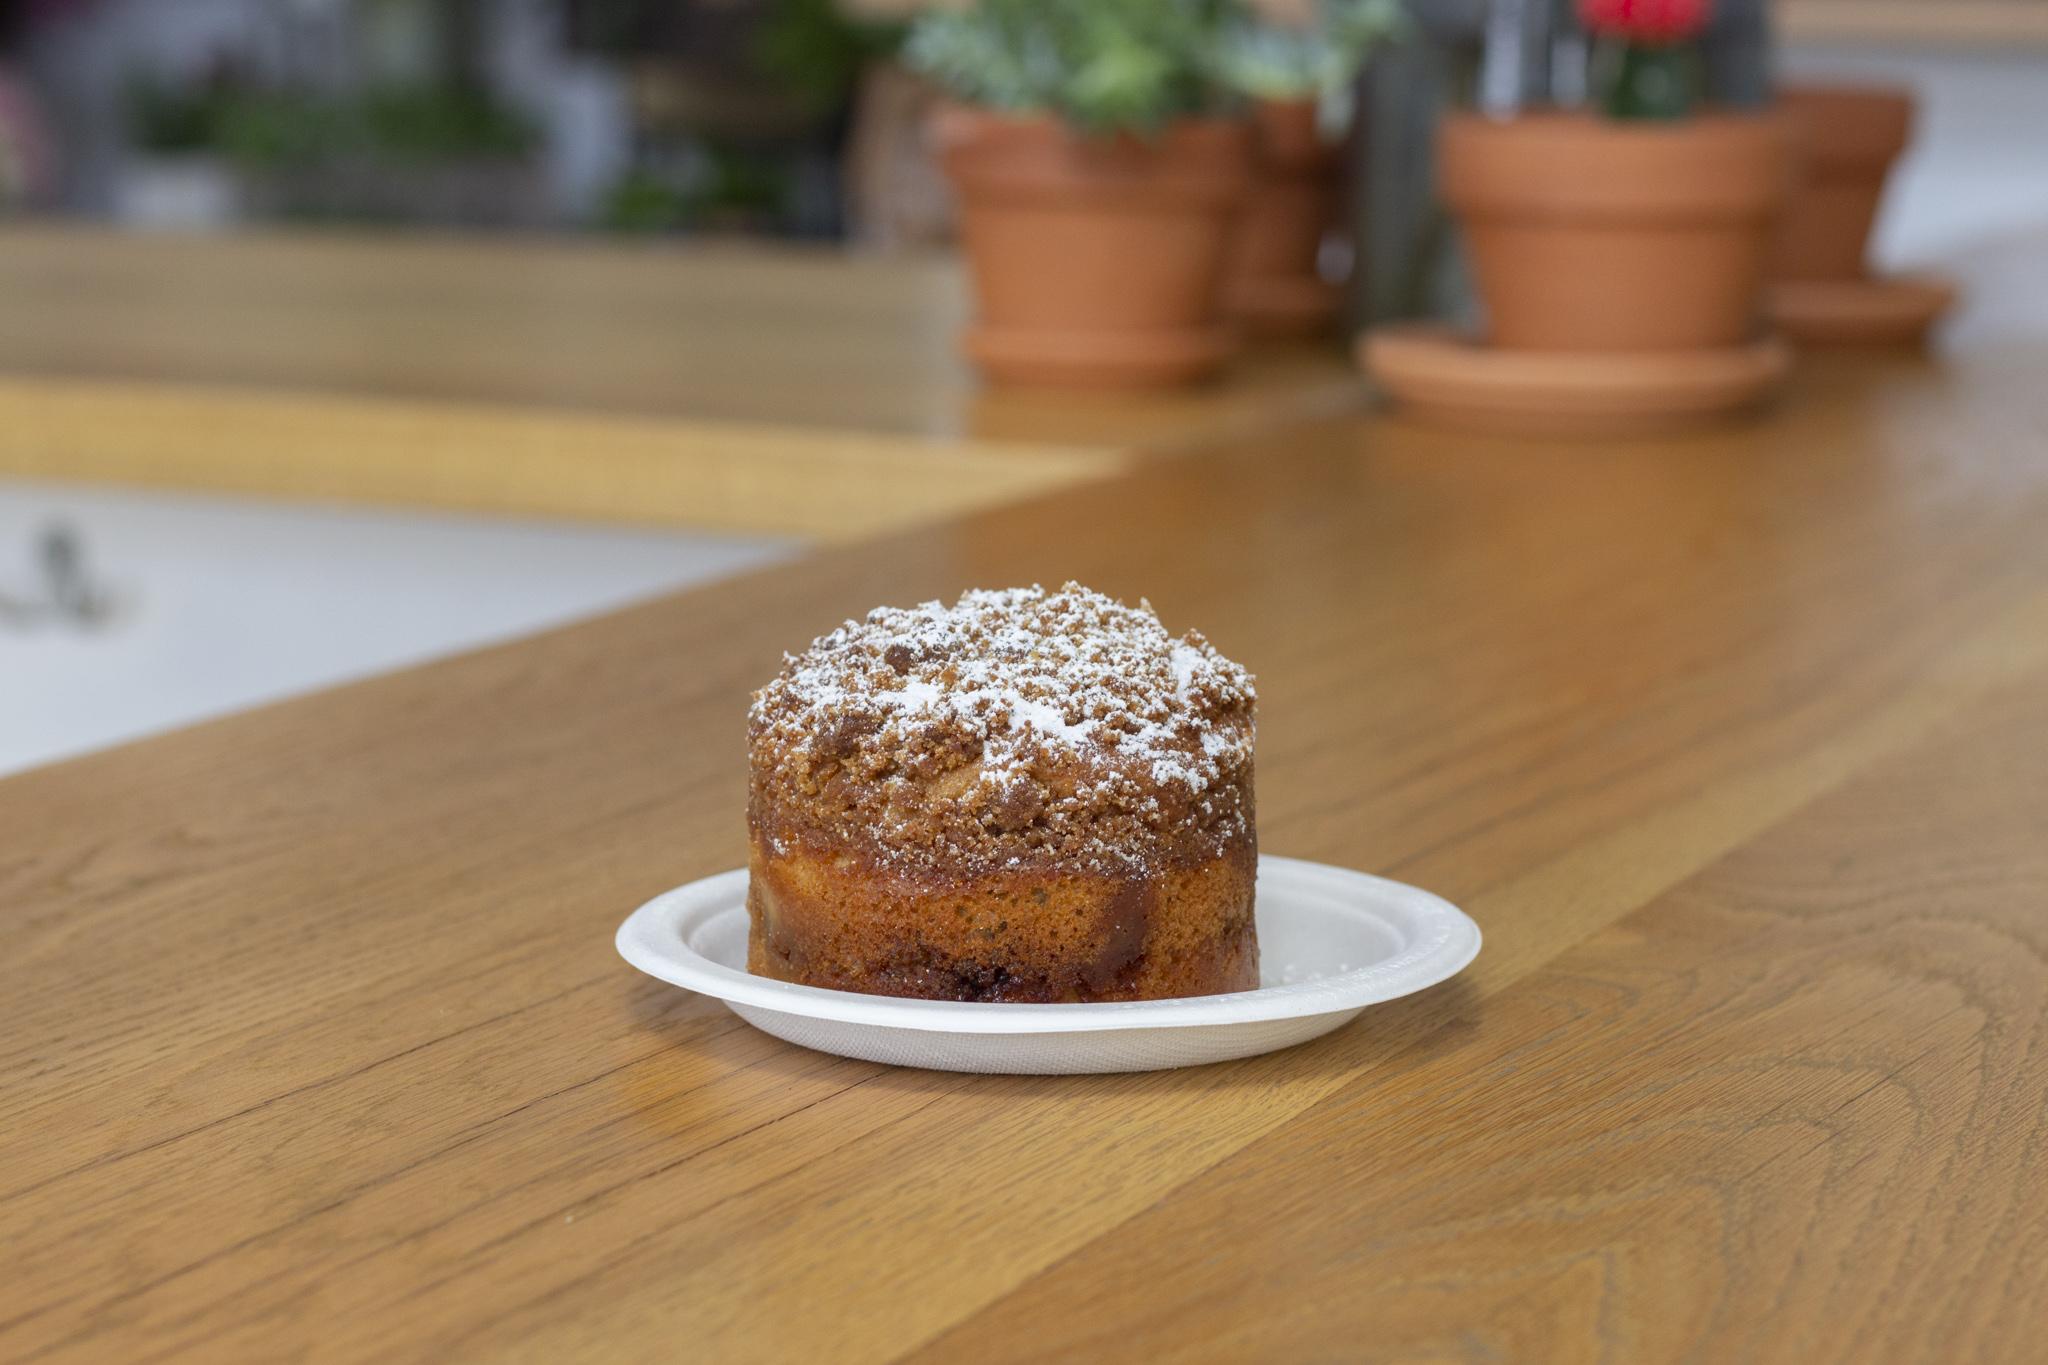 Cinnamon Coffee Cake from Valhalla Bakery